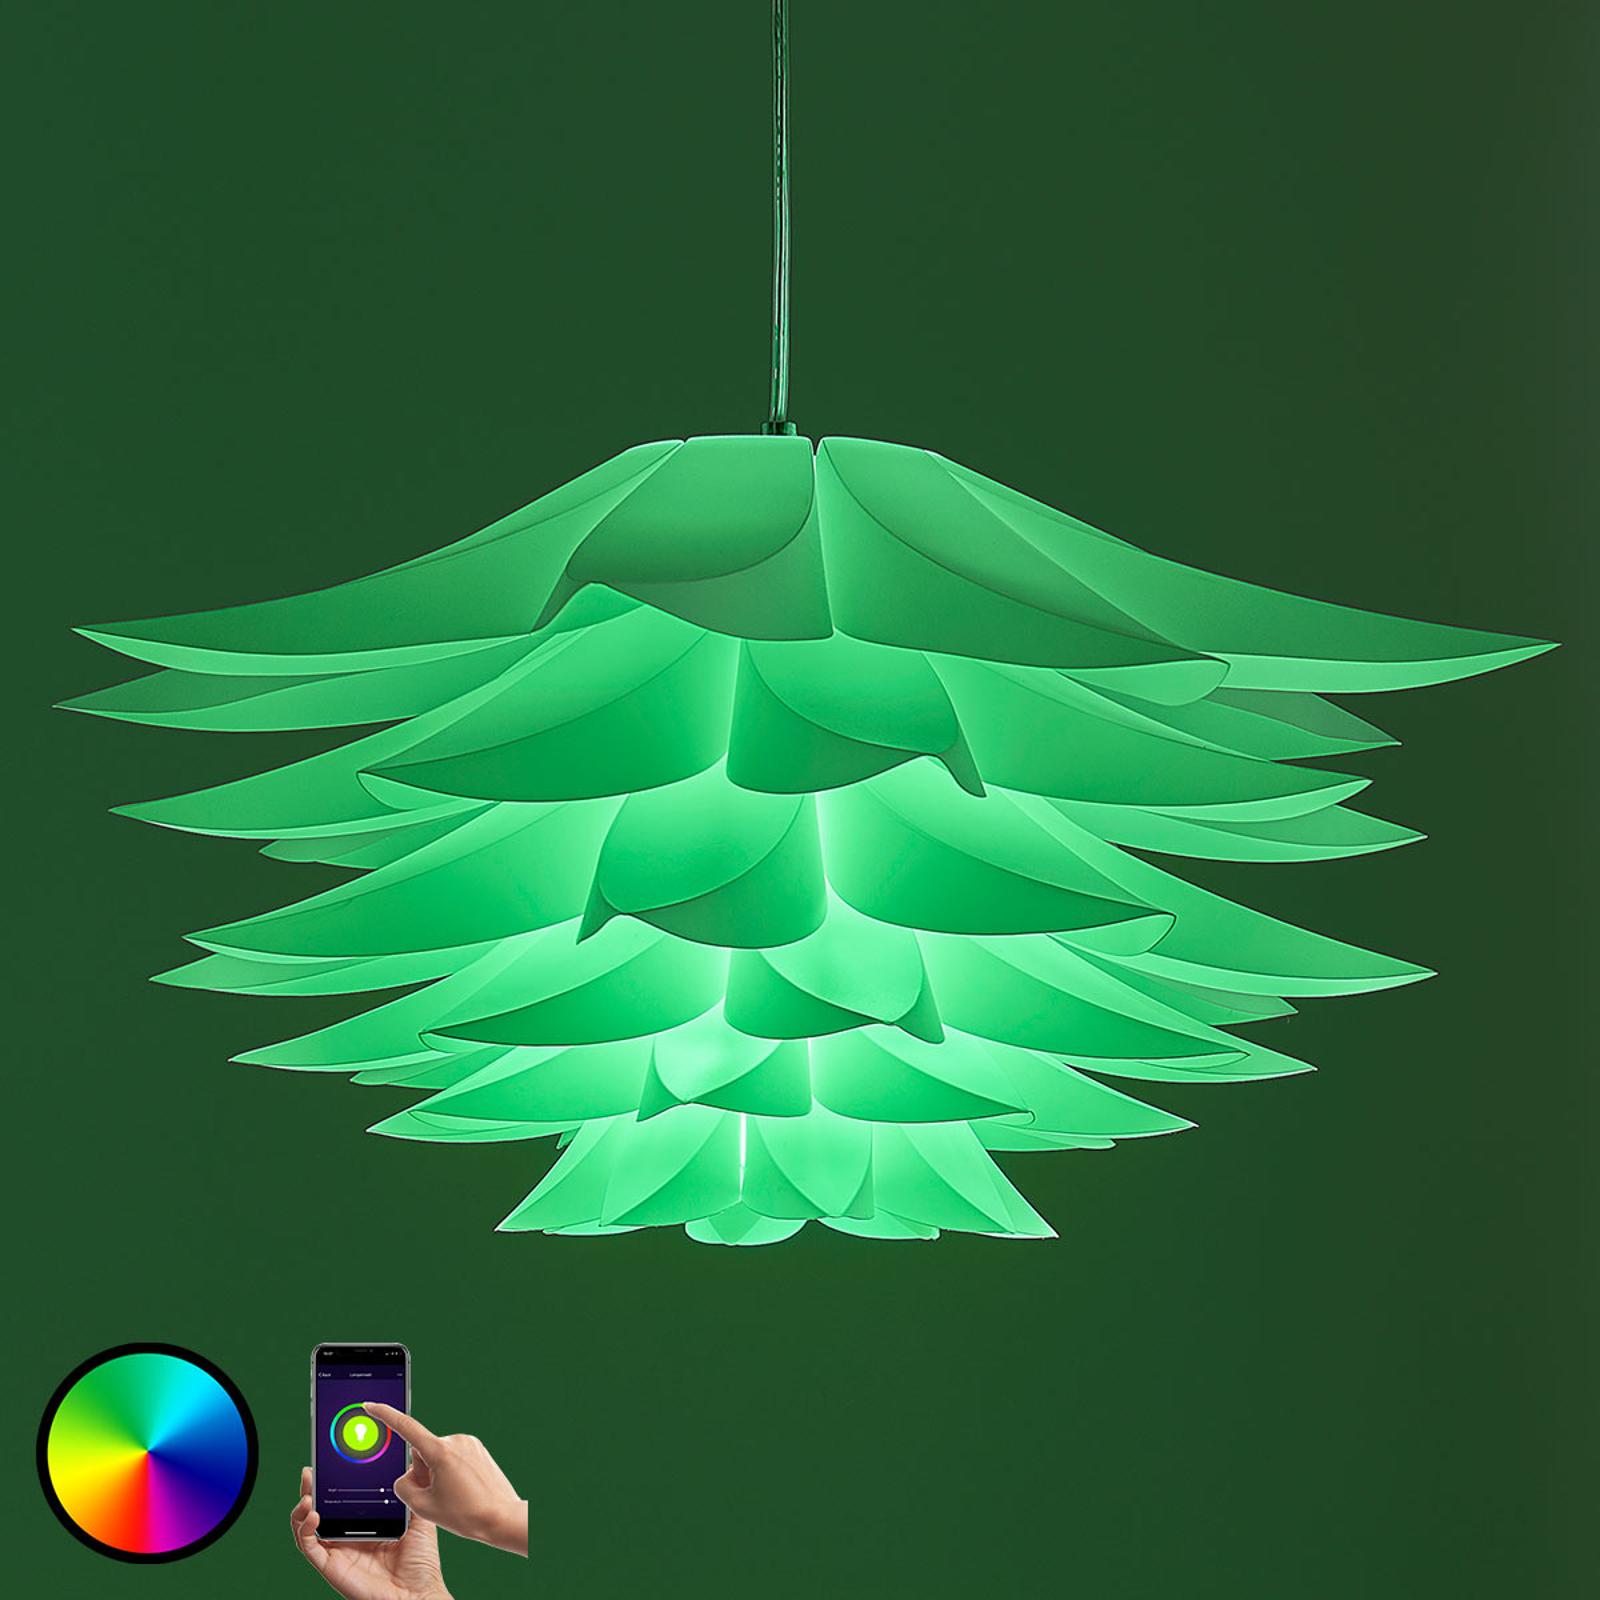 Lindby Smart hanglamp Lavinja met RGB-LED-lamp